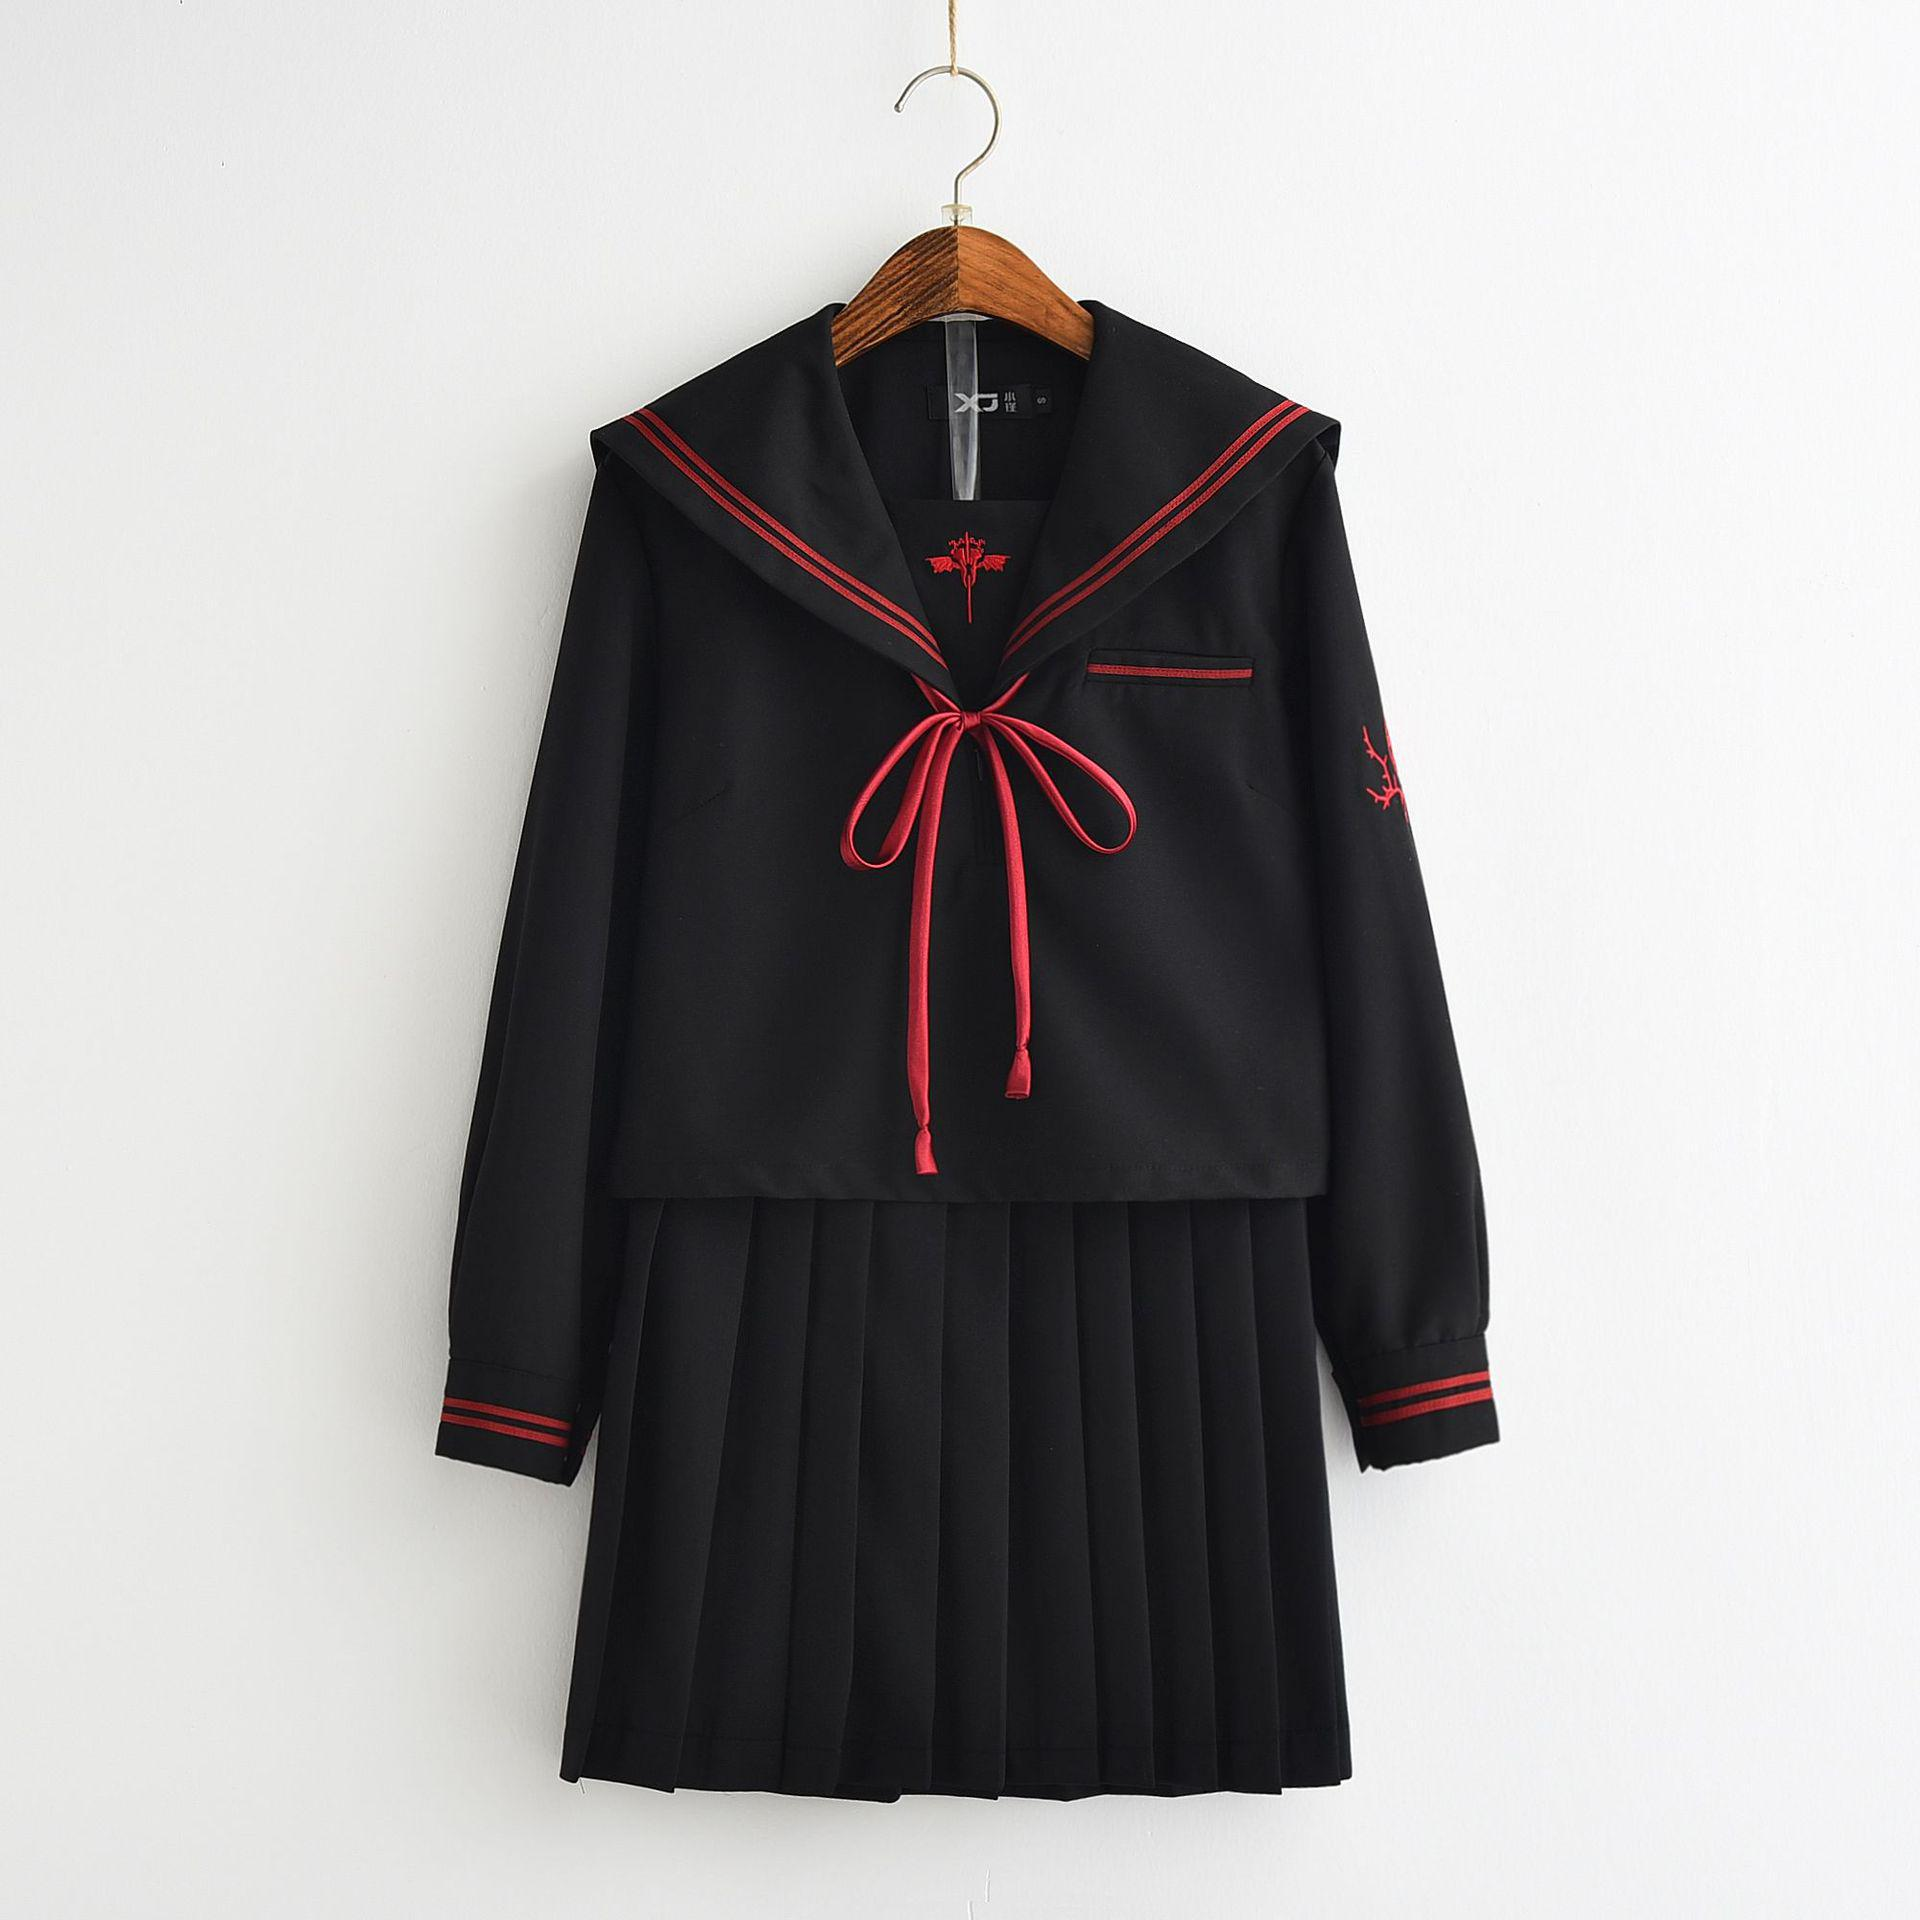 New School Uniforms Japanese Dark Devil Bad Junior Design Long Sleeve Autumn Winter Collage Student Sailors Uniforms Jk Cosplay